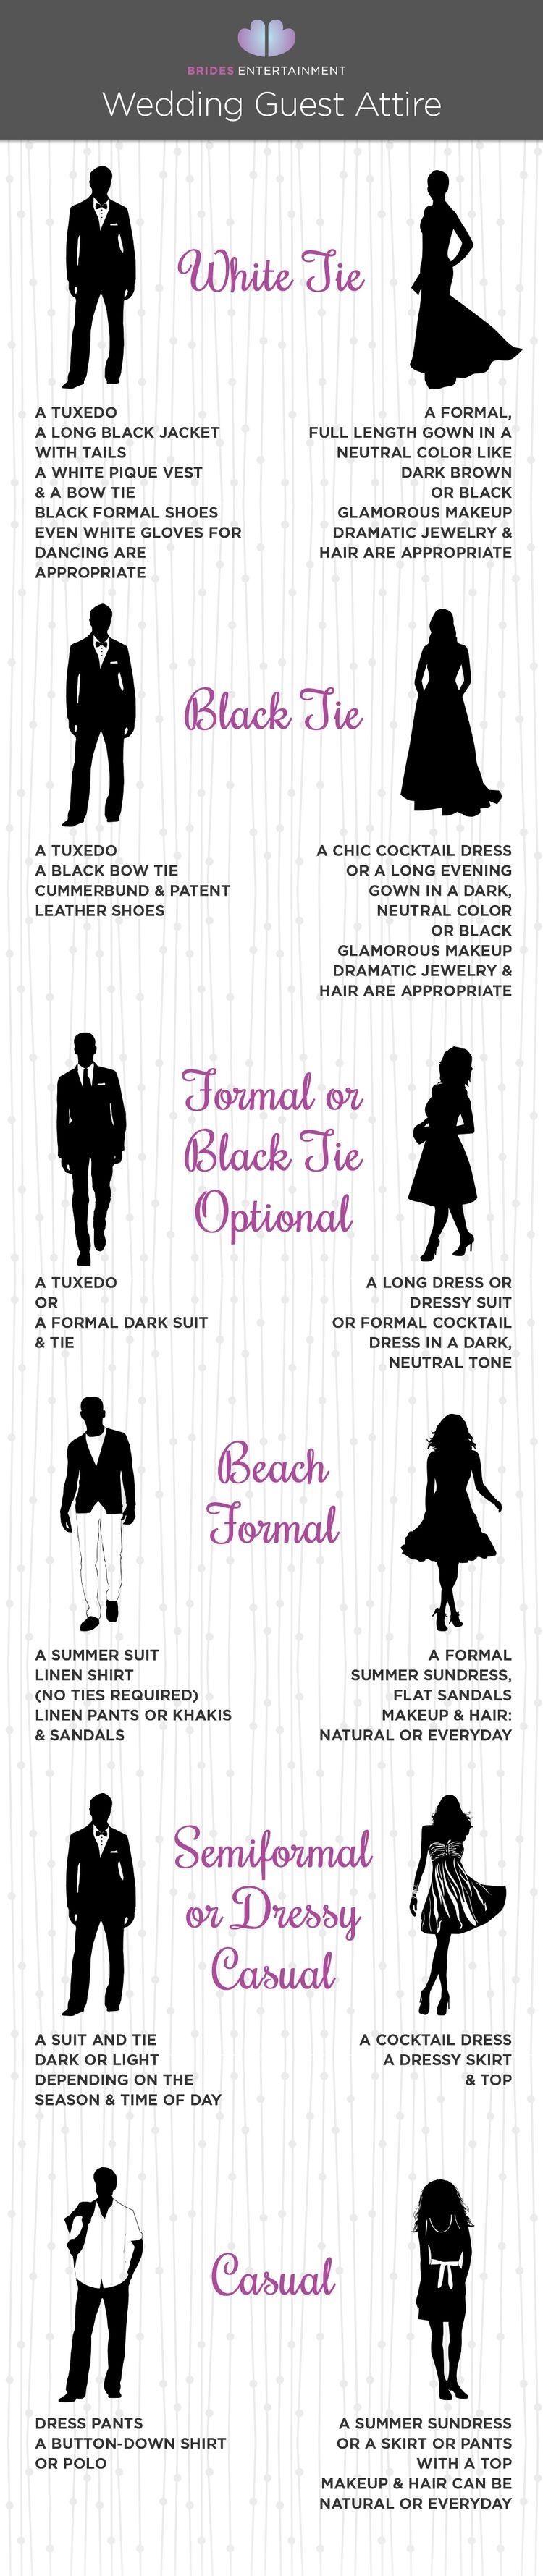 Pin By Fanni Benkovics On Good To Know Wedding Attire Guest Wedding Guest Outfit Wedding Guest Dress [ 3560 x 750 Pixel ]